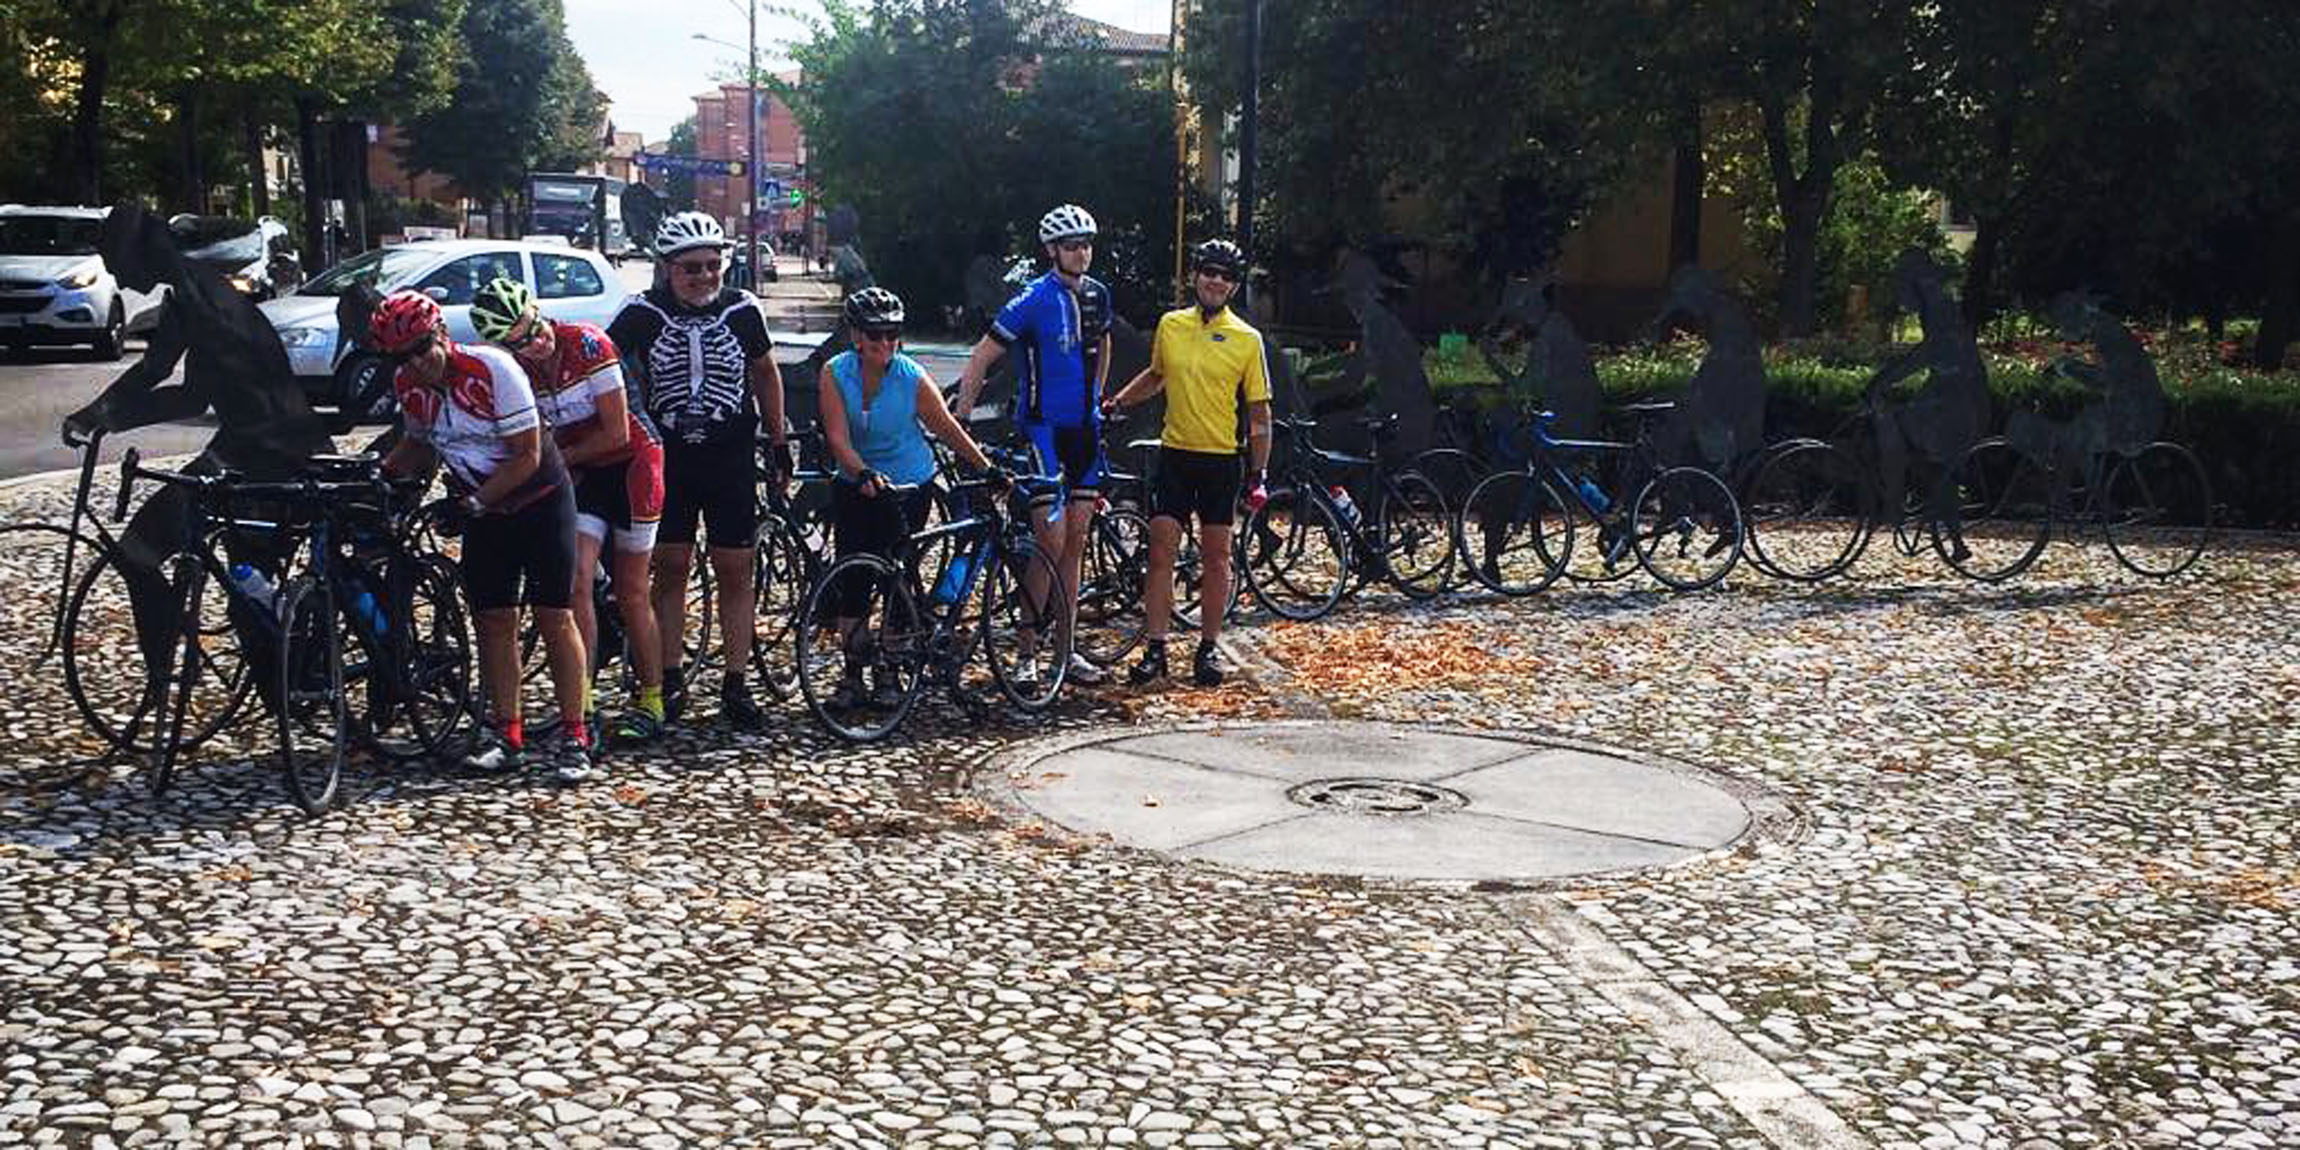 Emilia Romagna Cycling Trip